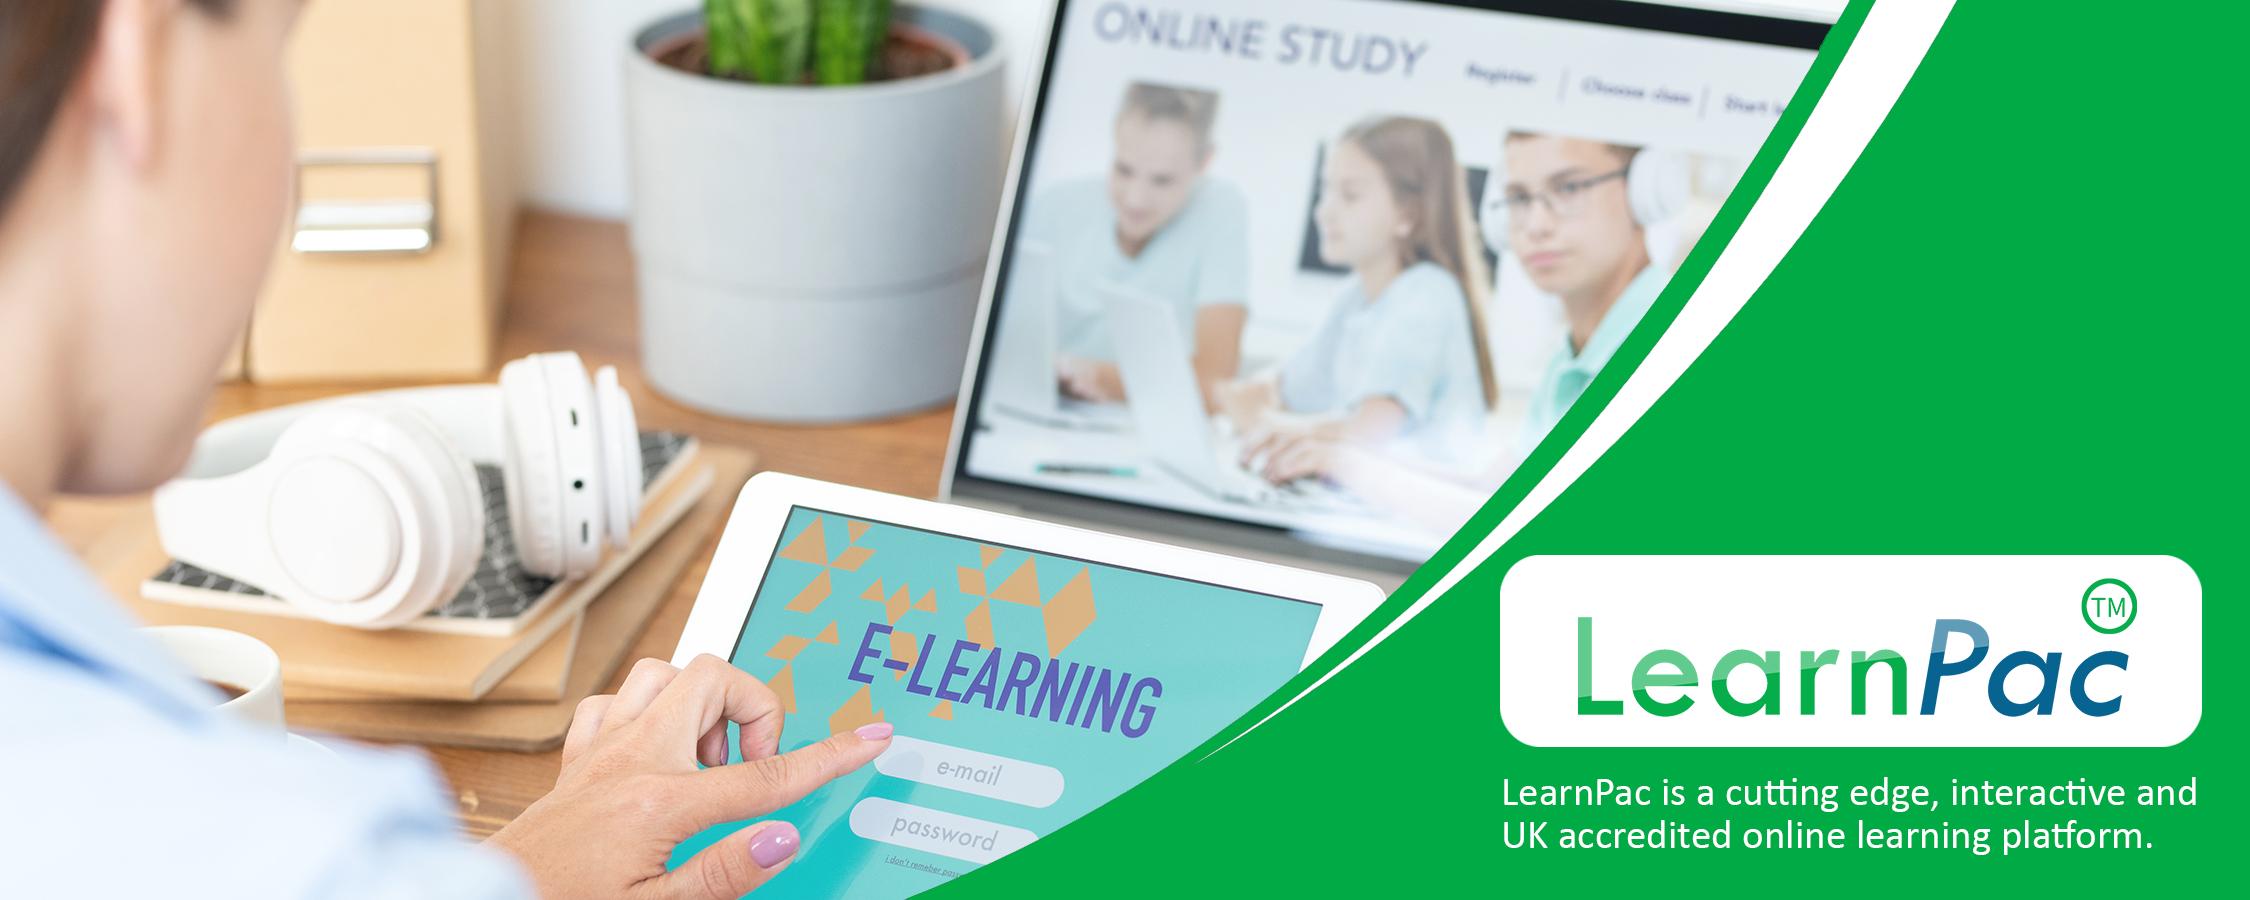 Employee Motivation Training - Online Learning Courses - E-Learning Courses - LearnPac Systems UK -